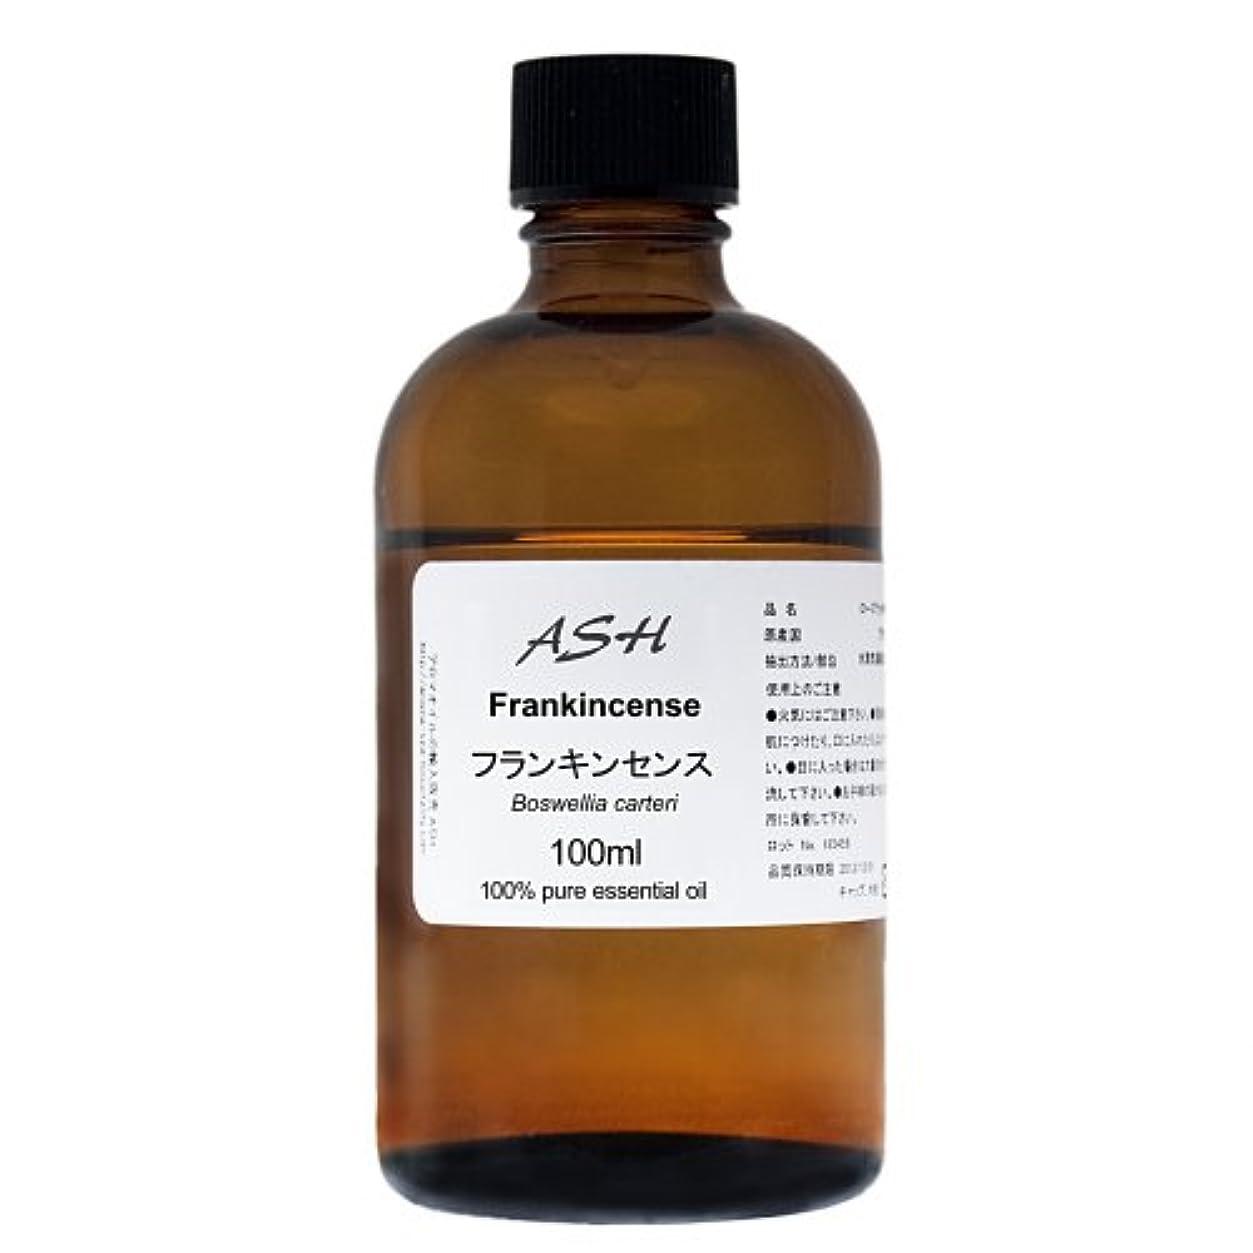 ASH フランキンセンス エッセンシャルオイル 100ml AEAJ表示基準適合認定精油